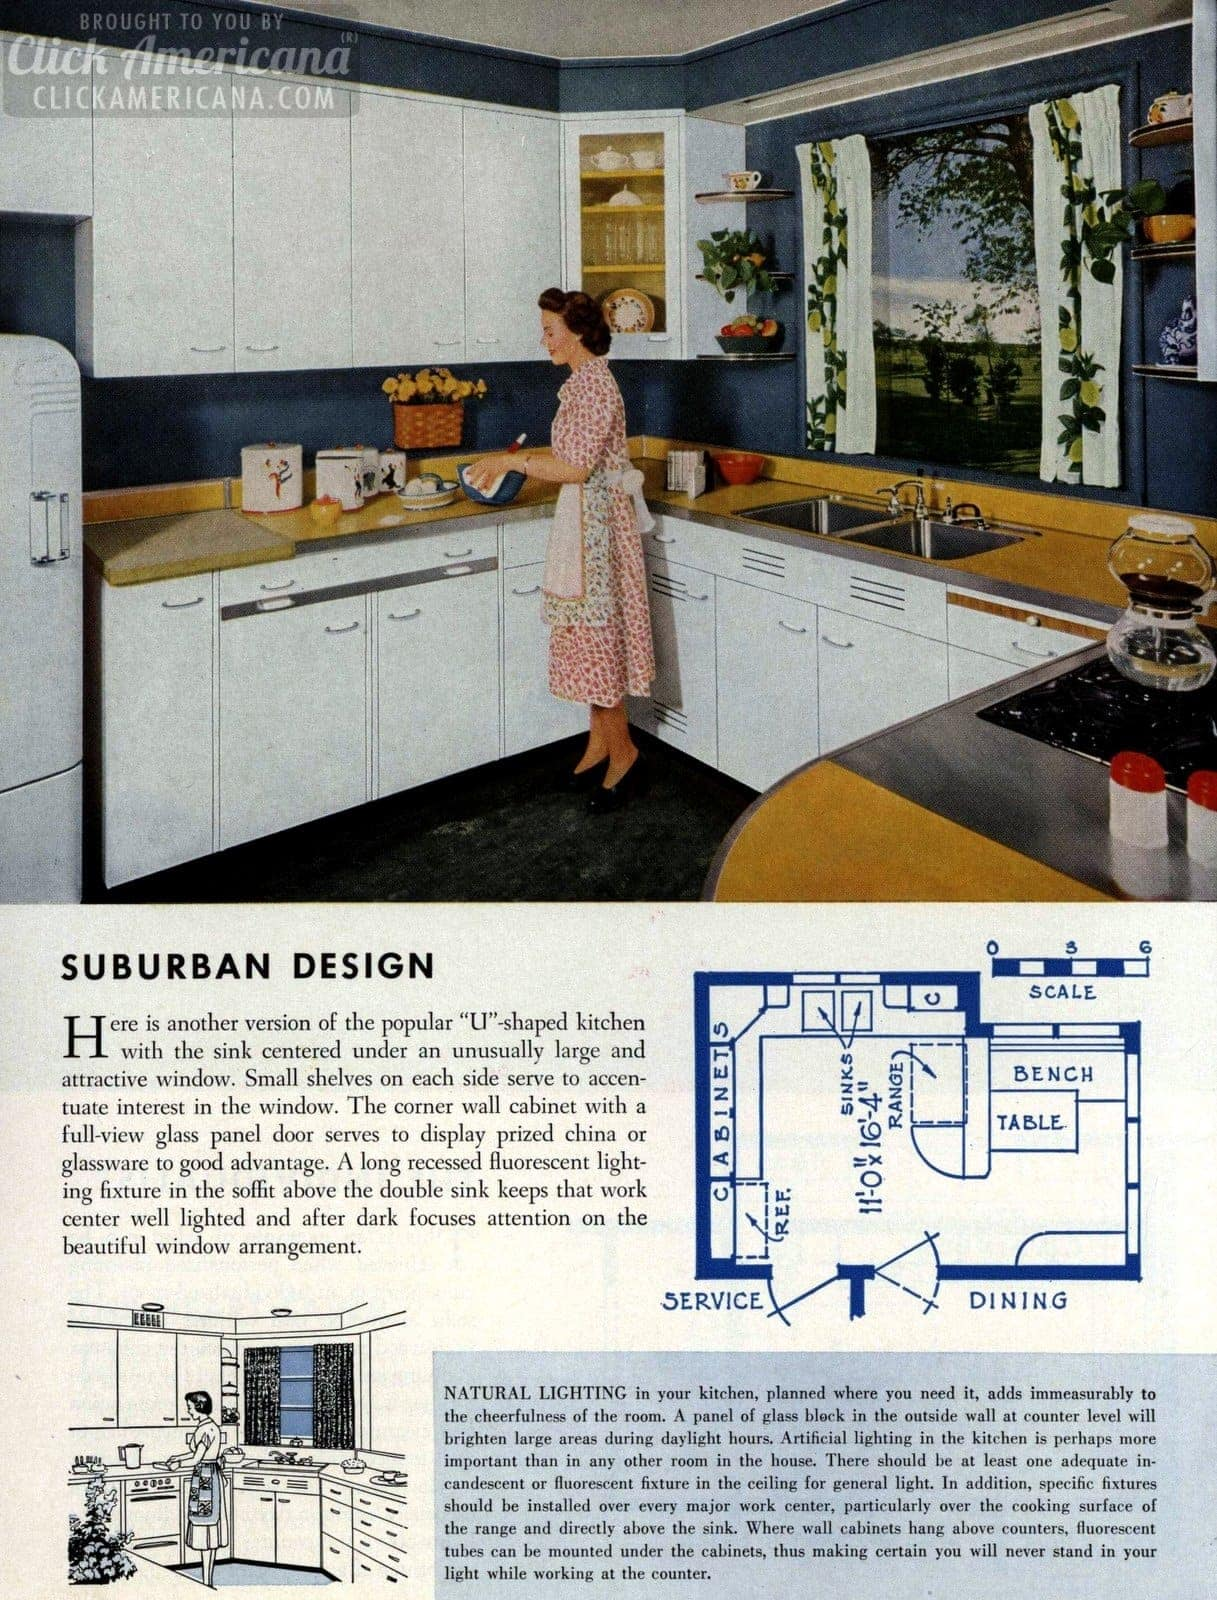 Suburban design Remodeled kitchen design 1954